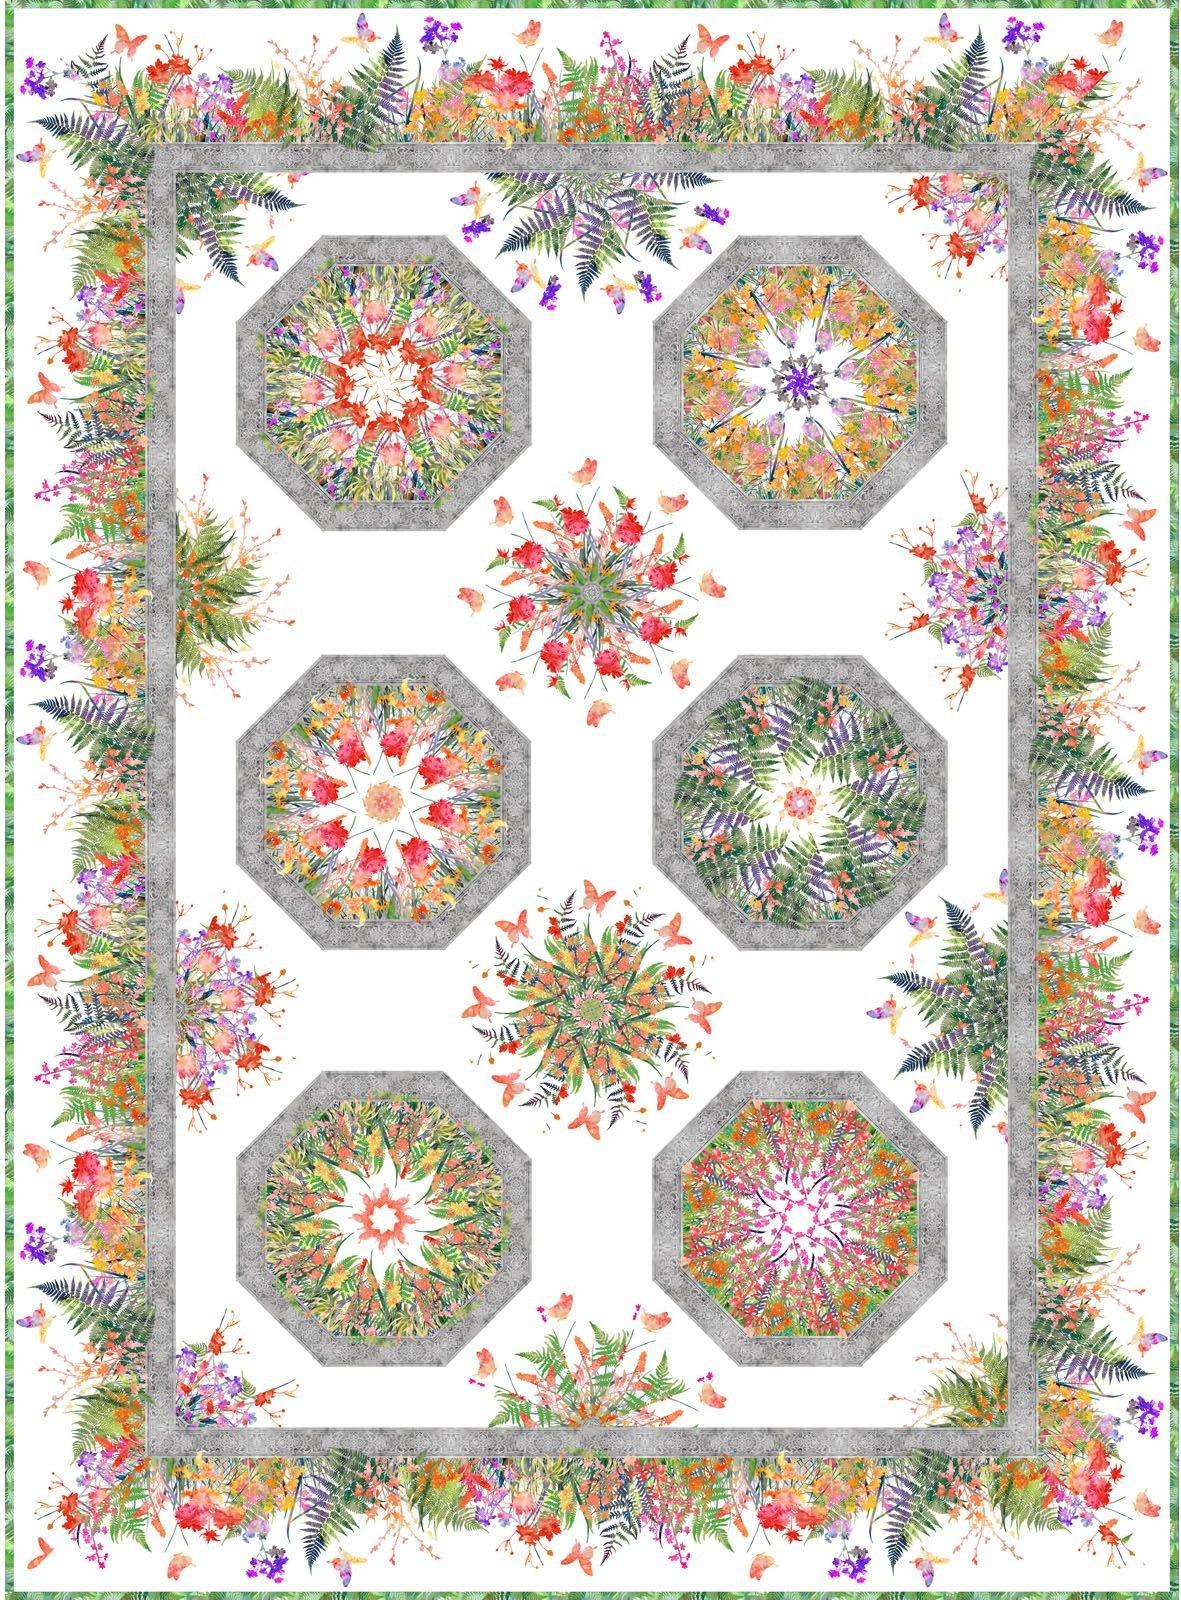 In The Beginning - Garden of Dreams by Jason Yenter - One Fabric Kaleidoscope Quilt KIT!